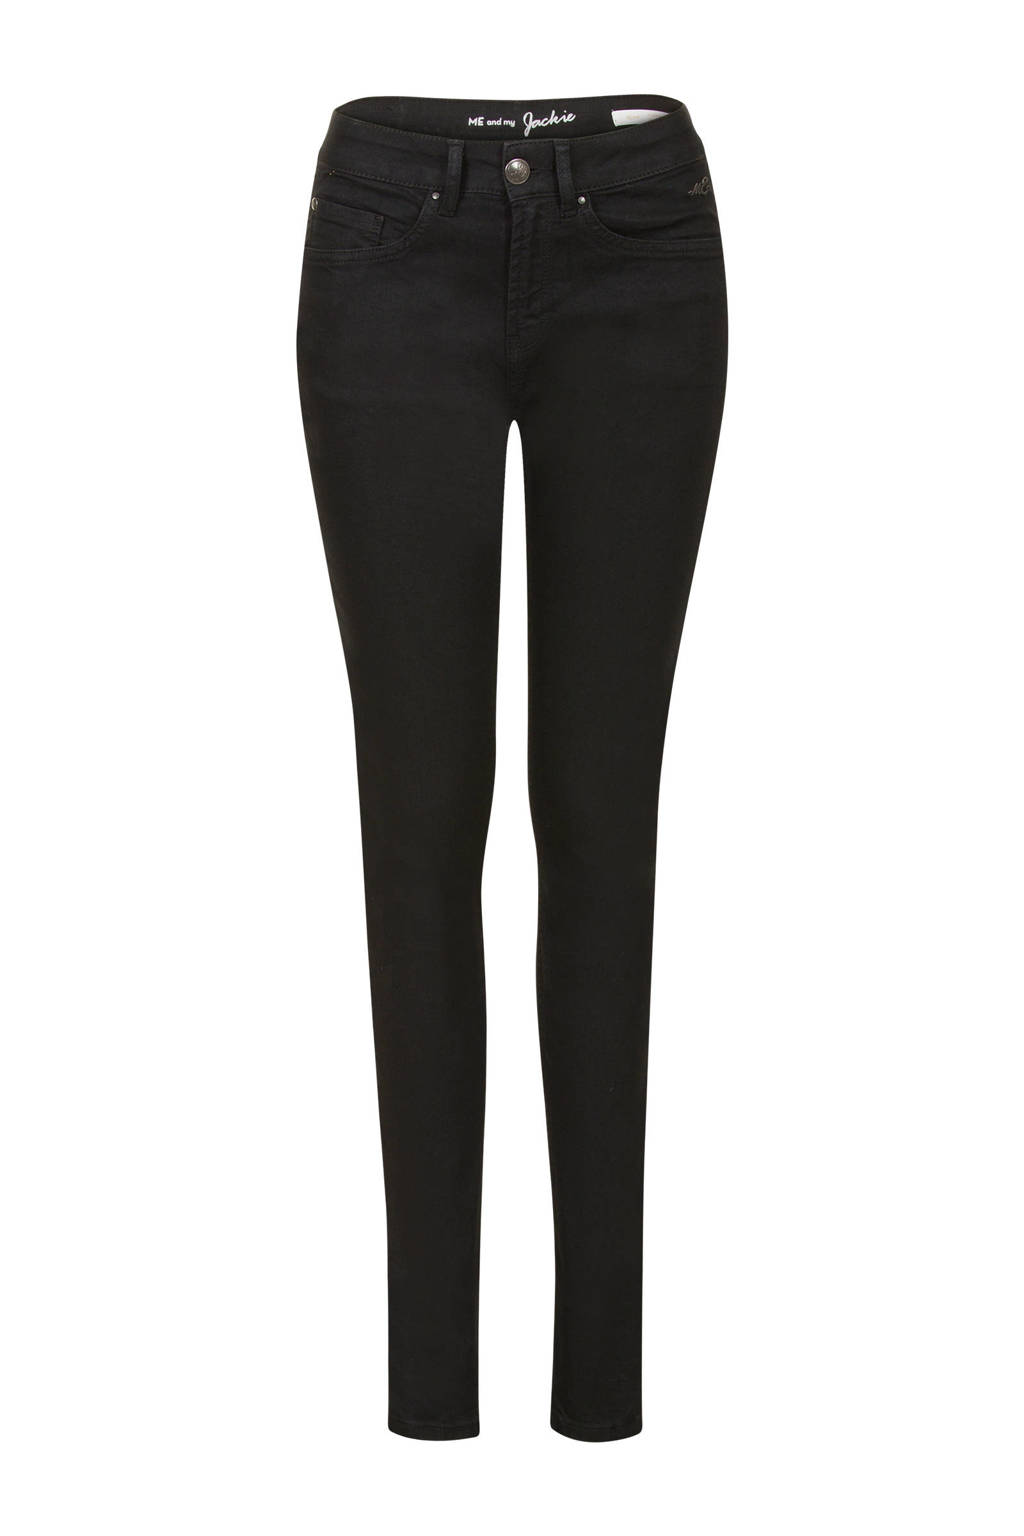 Miss Etam Regulier slim fit jeans Jackie zwart, Zwart